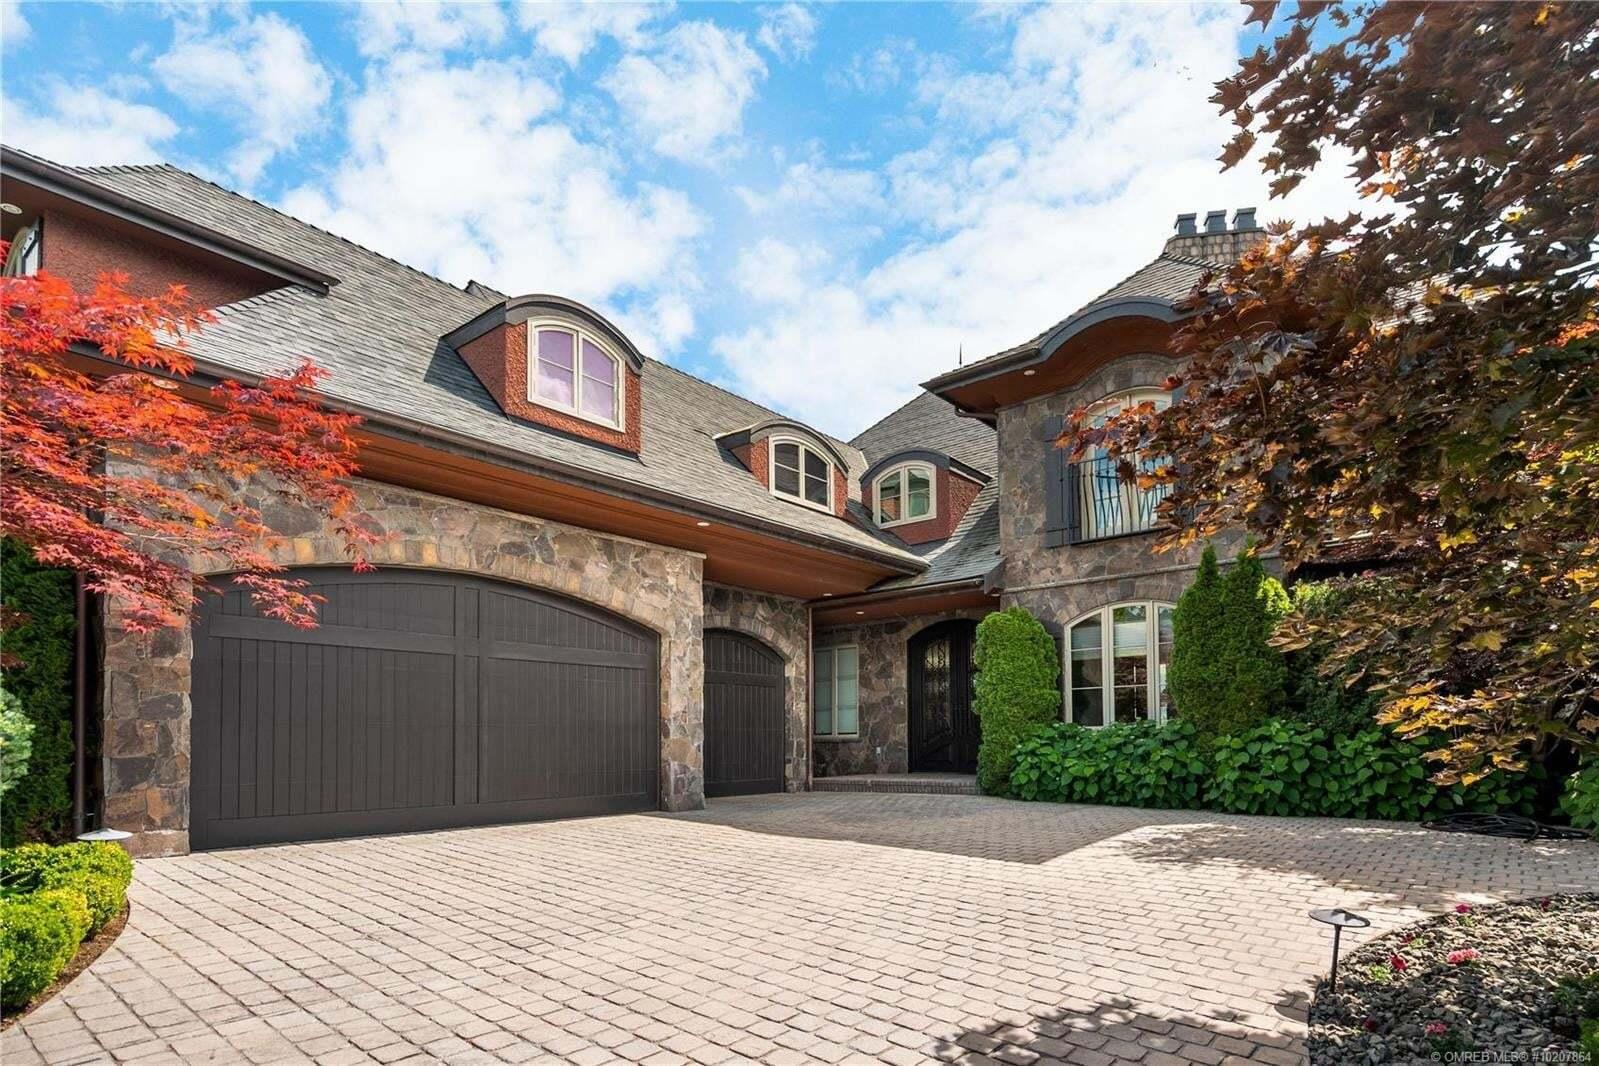 House for sale at 1001 Westpoint Dr Kelowna British Columbia - MLS: 10207864